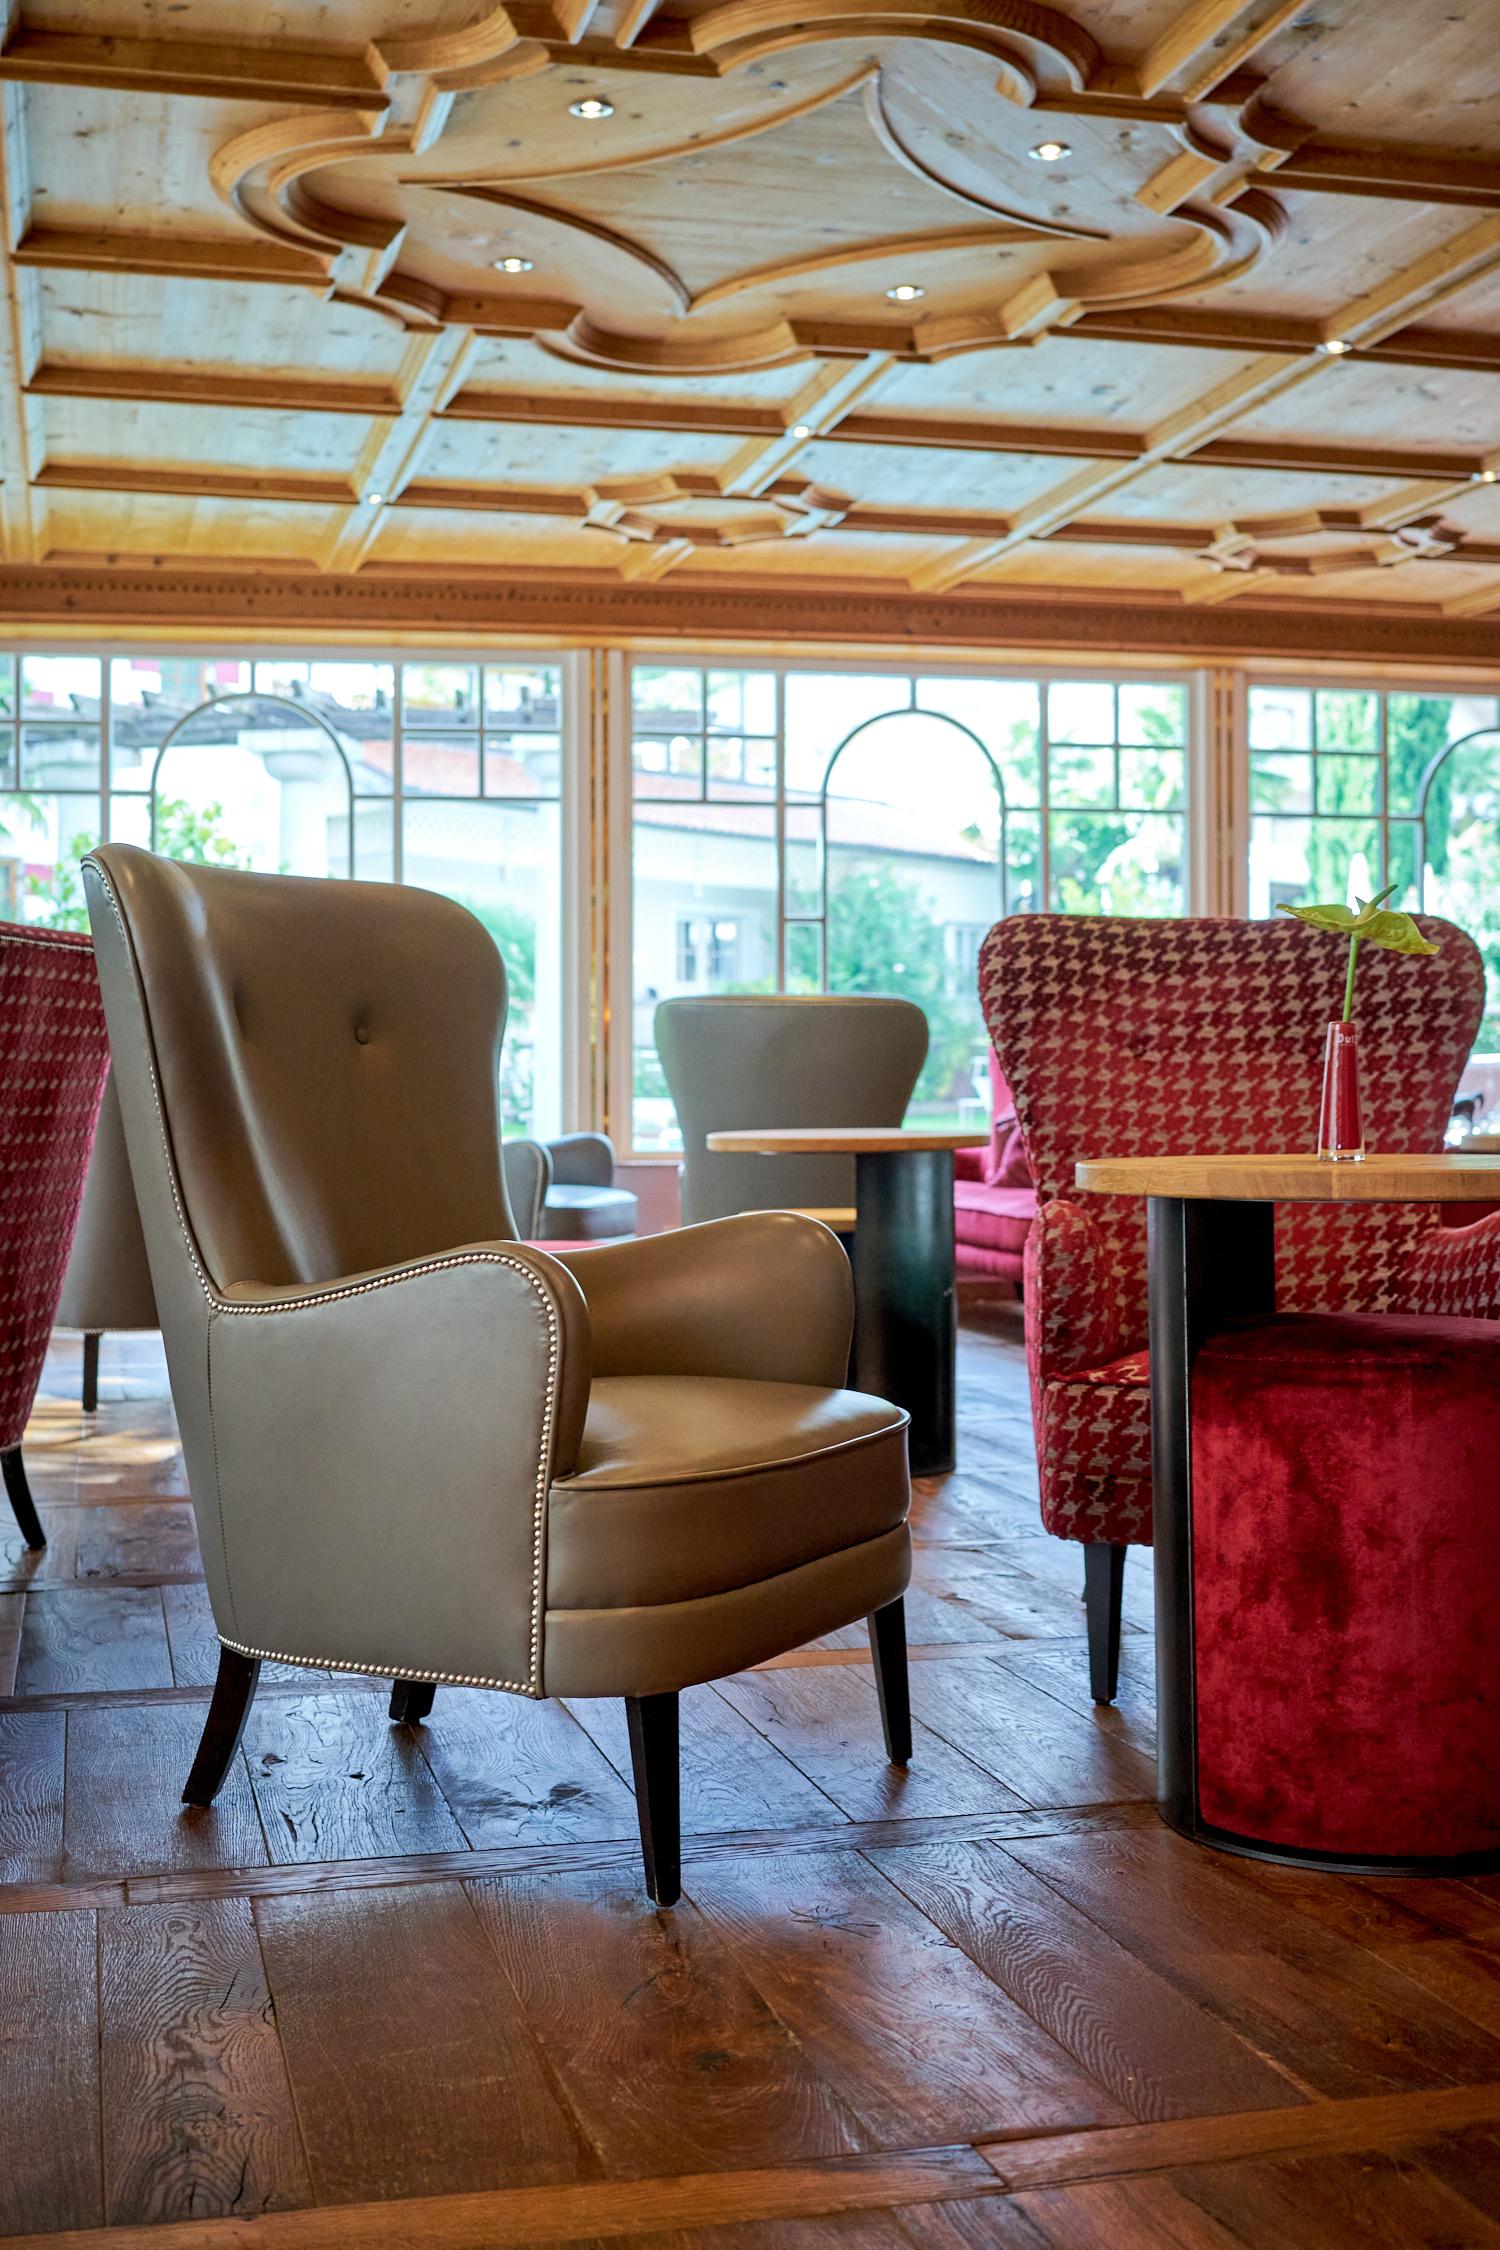 Romantik Hotel Oberwirt, Marling. 08.2020